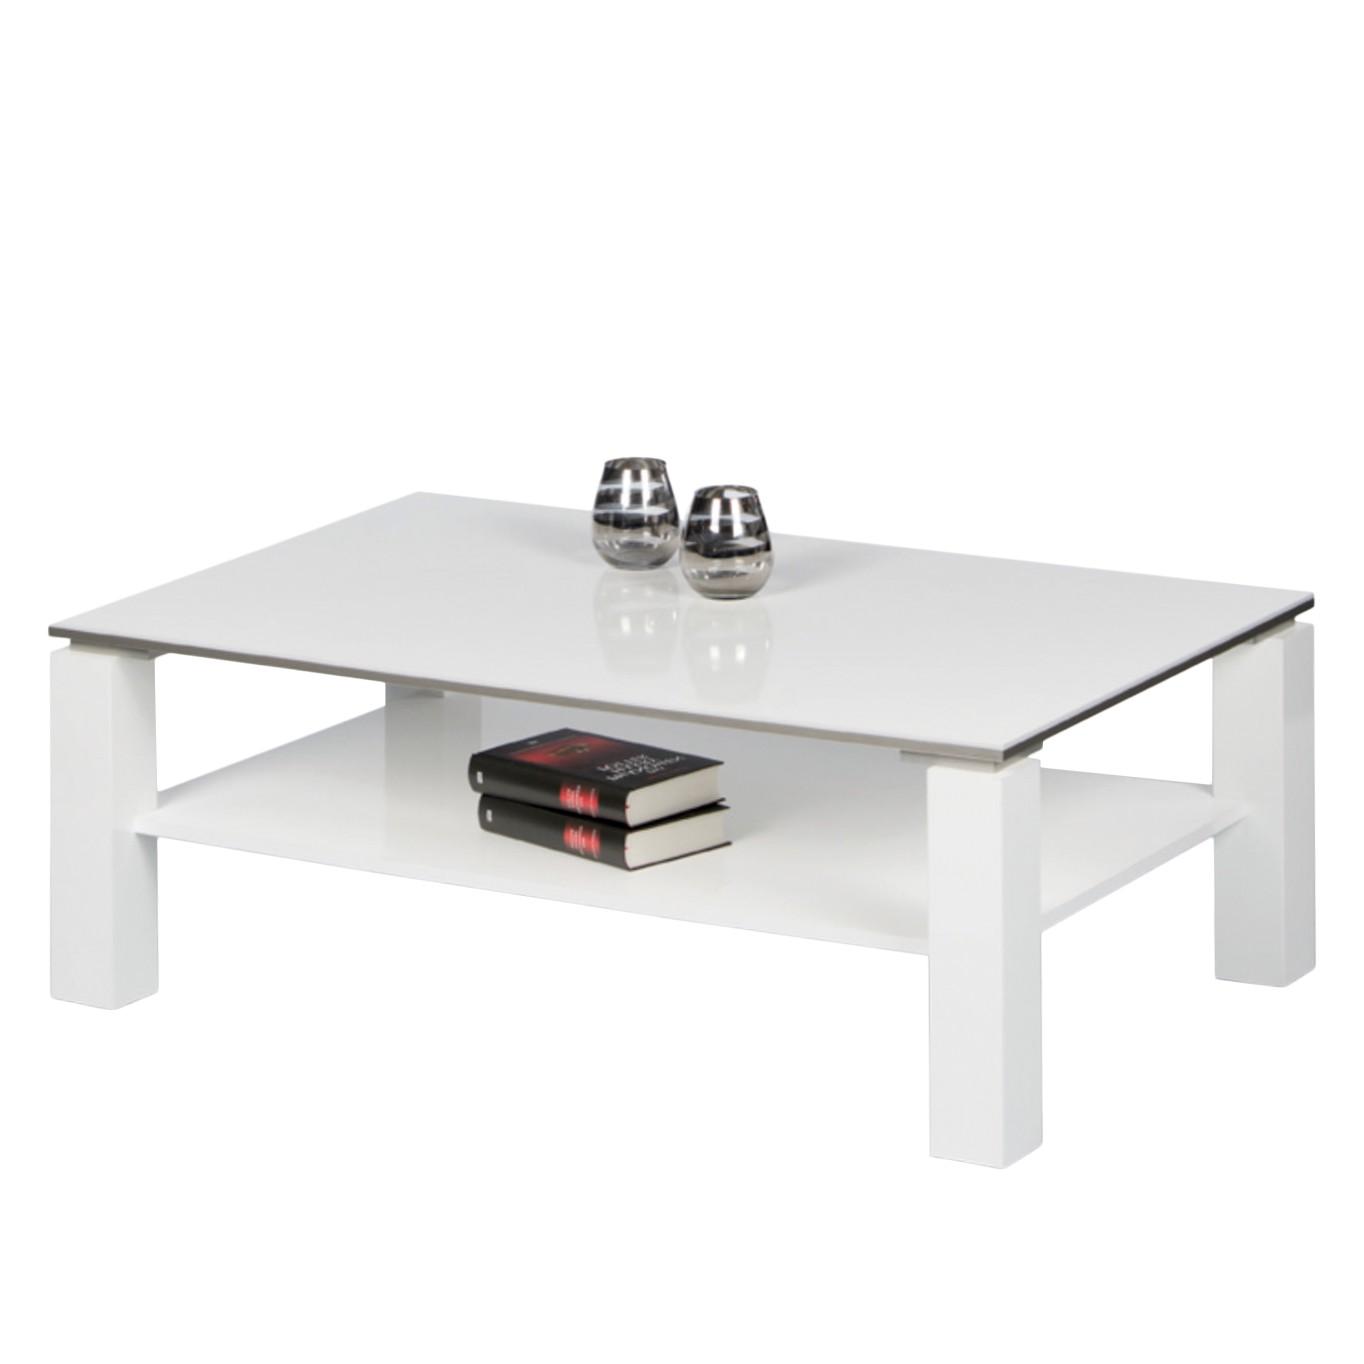 Table basse Vidora - Blanc brillant / Blanc - 110 x 70 cm, mooved